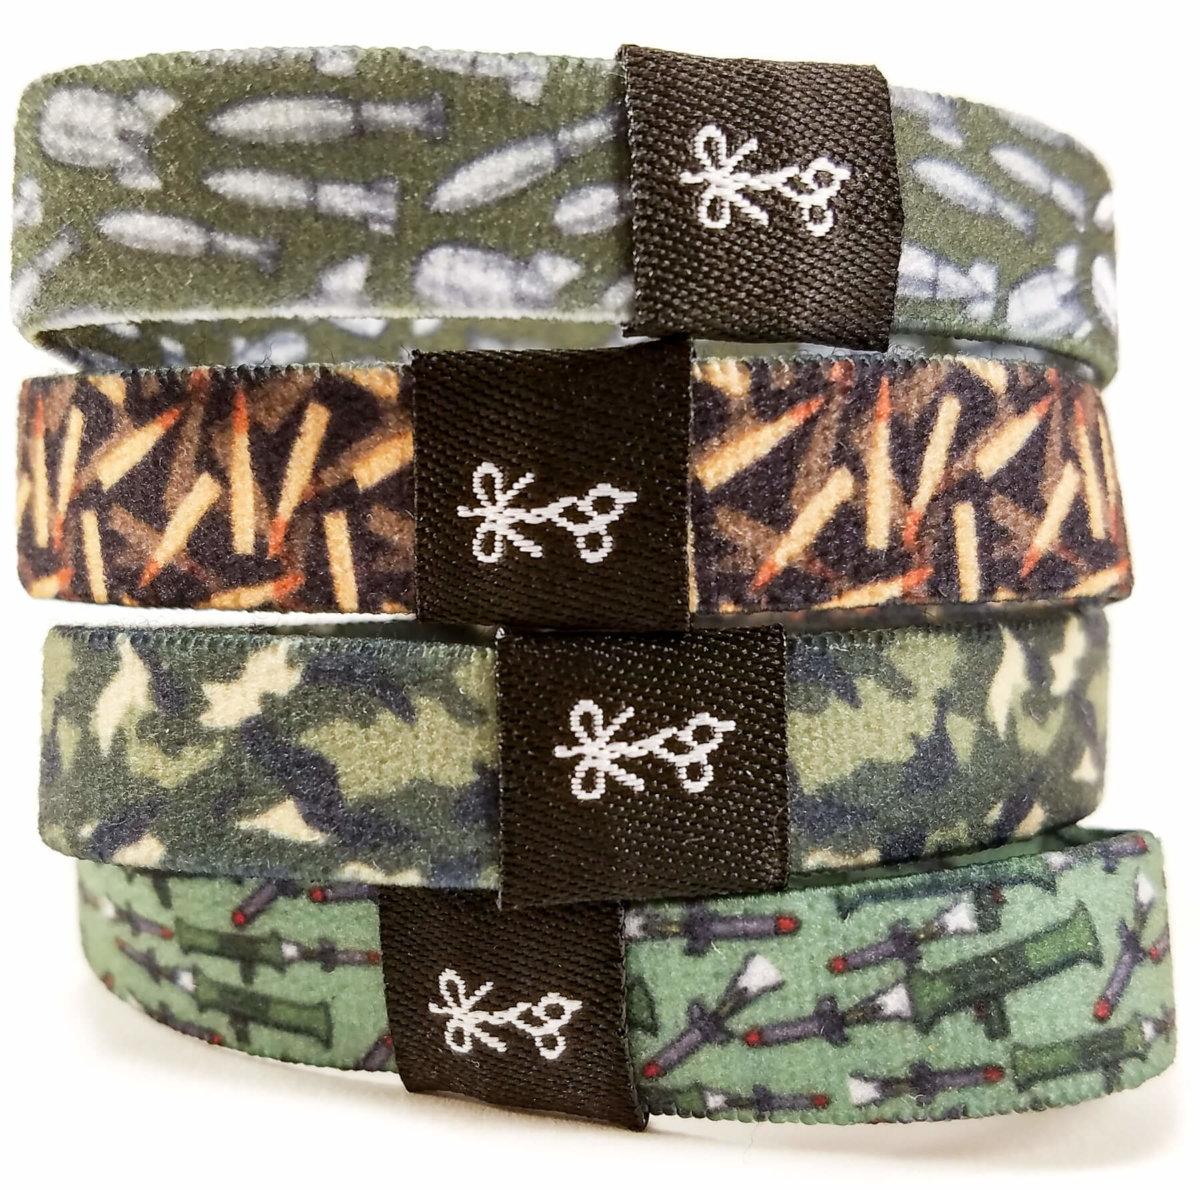 combat pack hair ties for guys